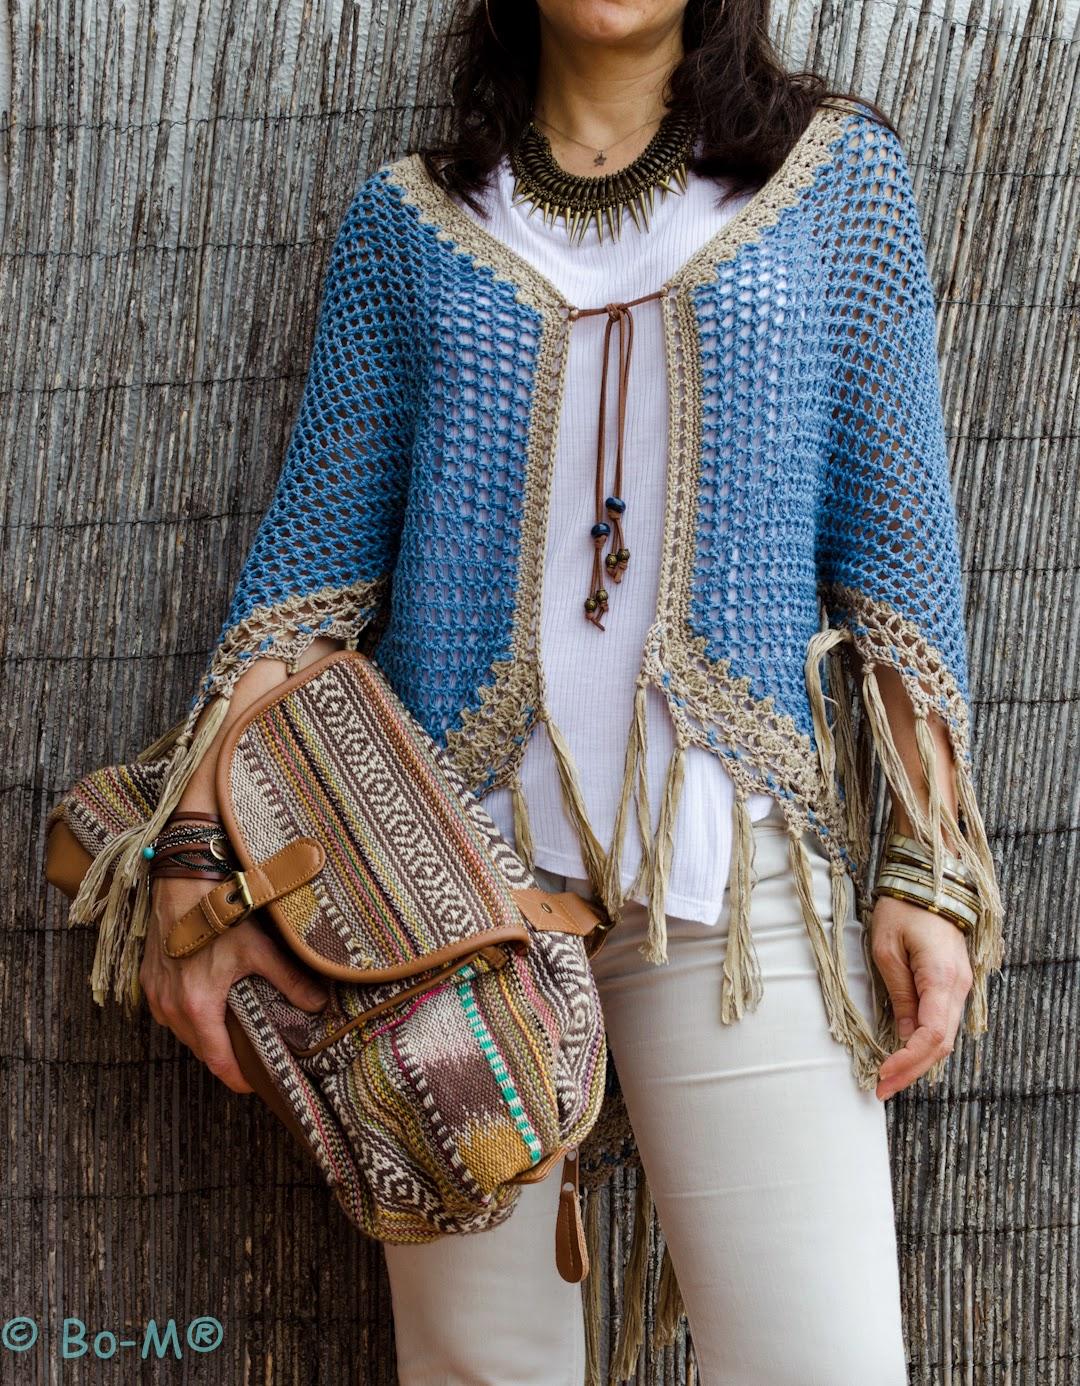 Bo-M: Kimono | Güzel tığ, Örgü, Kroşe üst